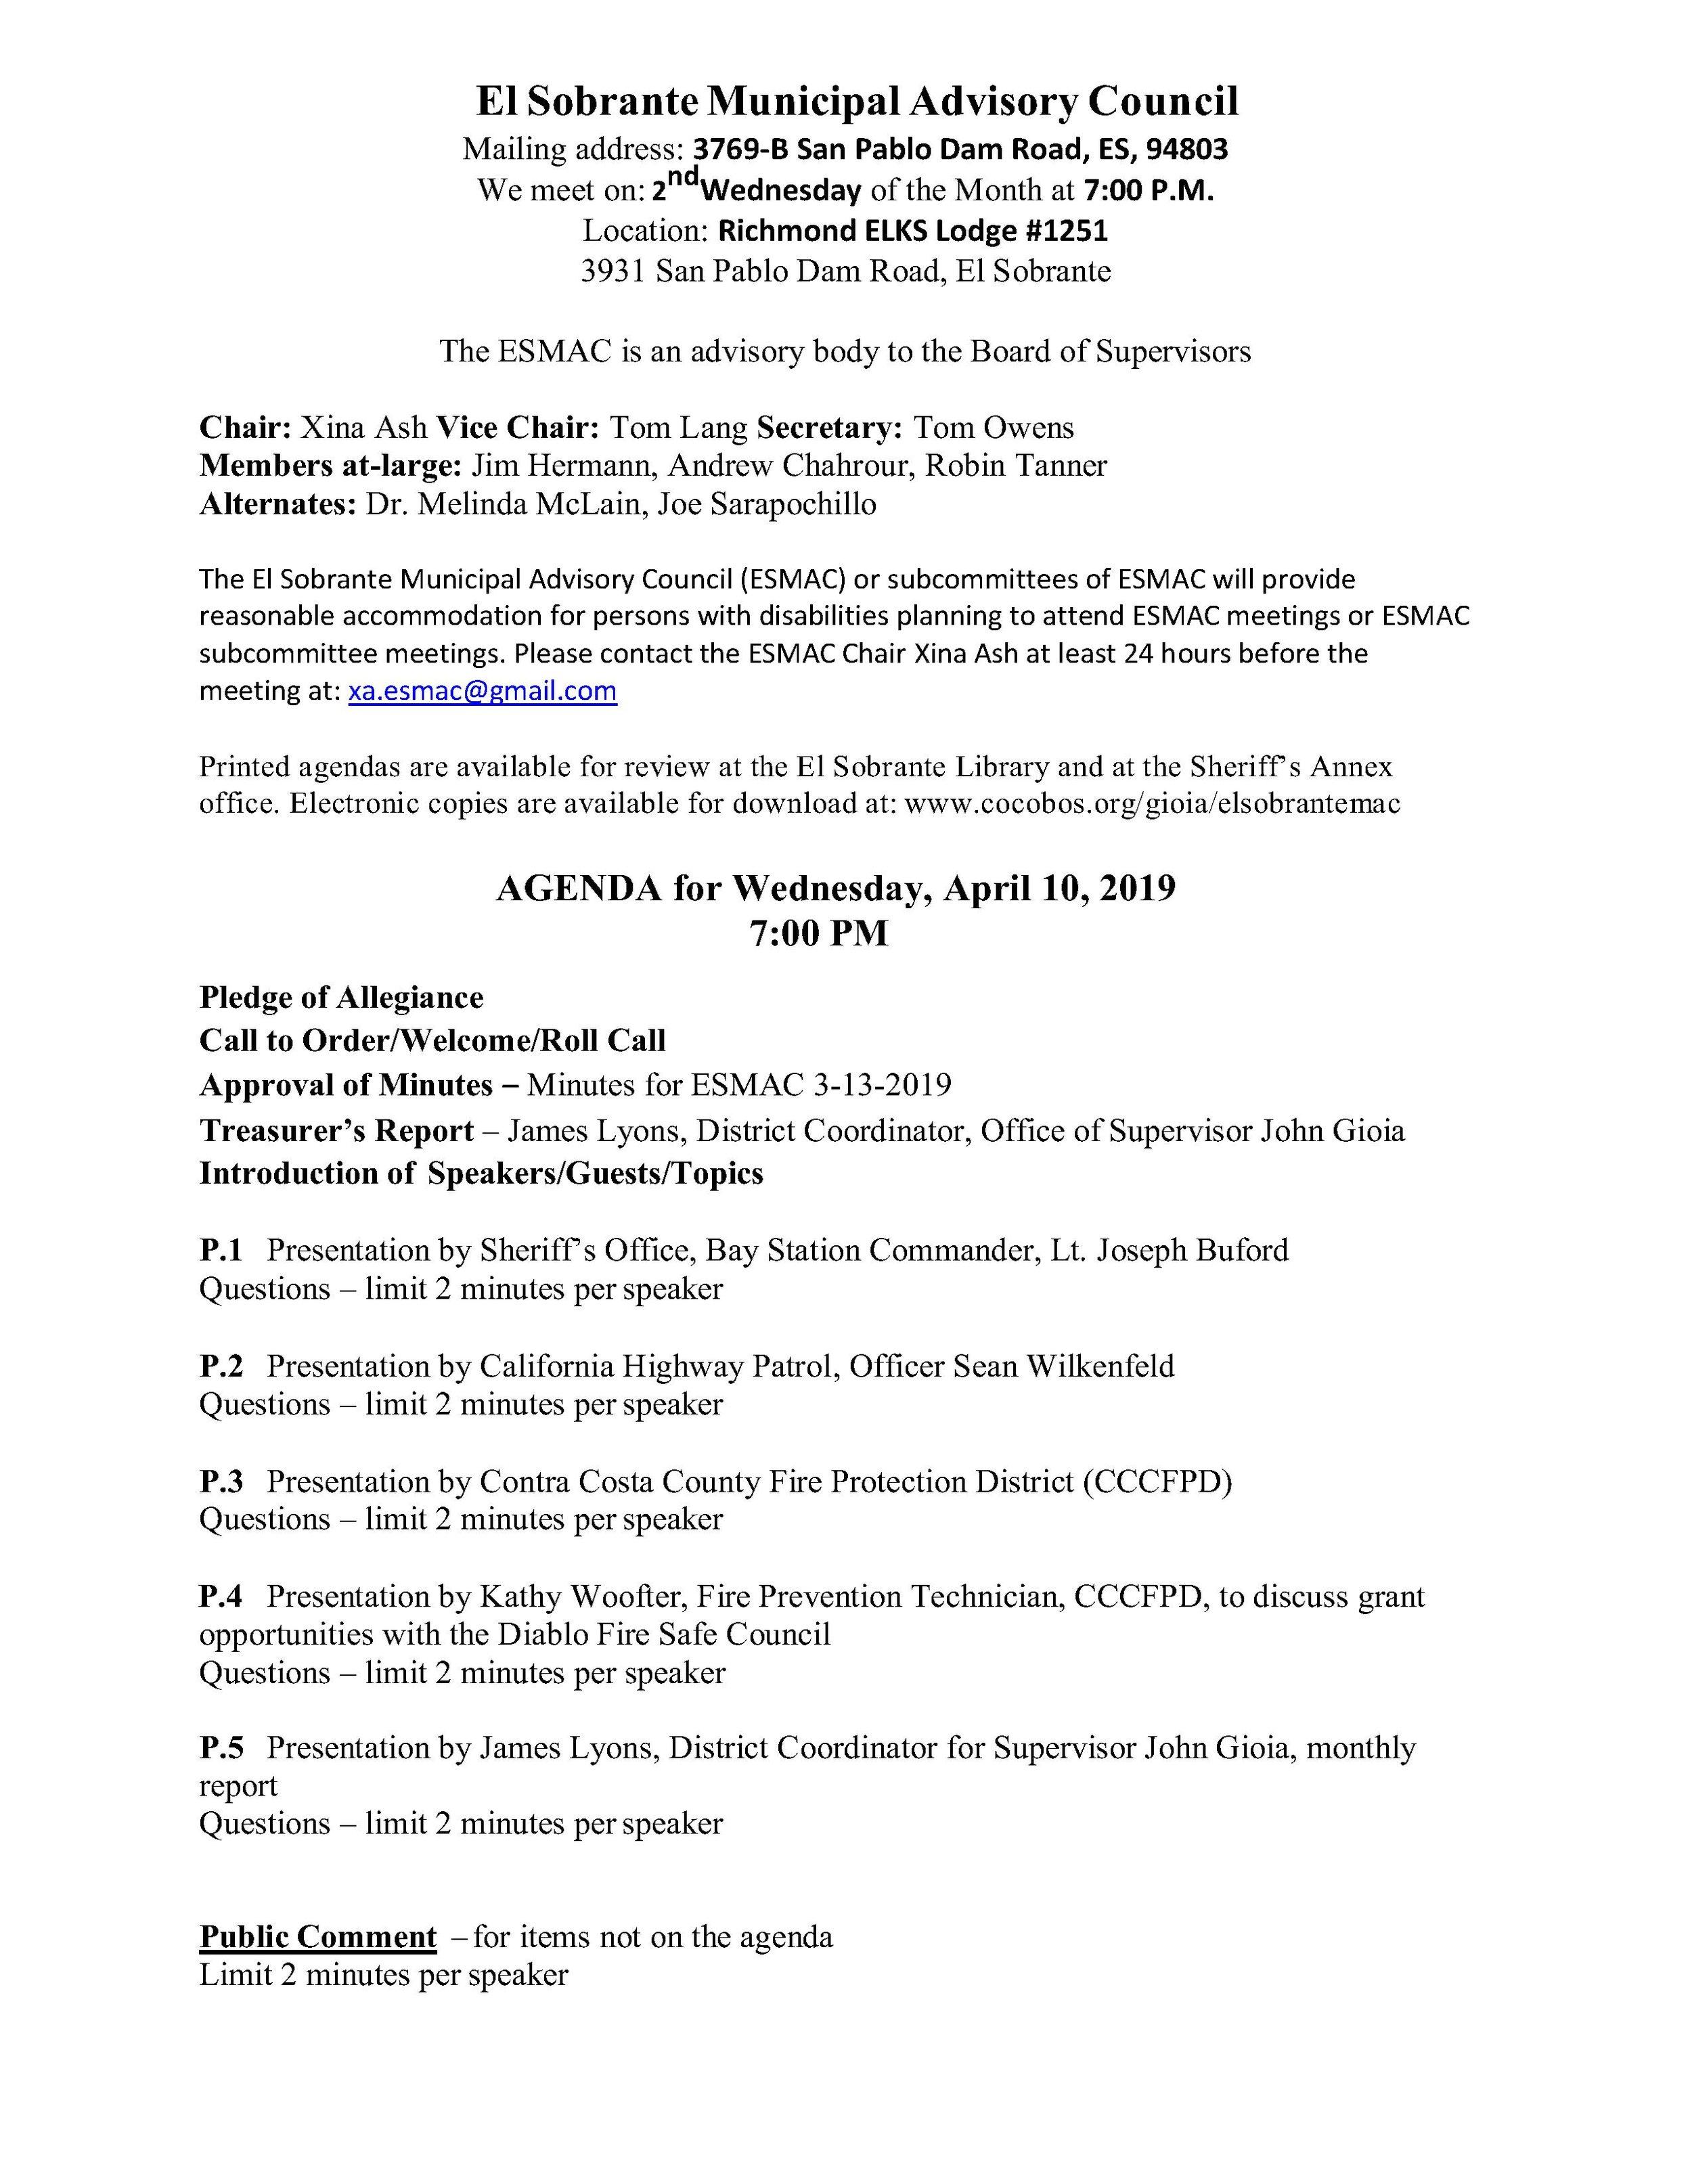 ESMAC Agenda 4.10.19_1.jpg